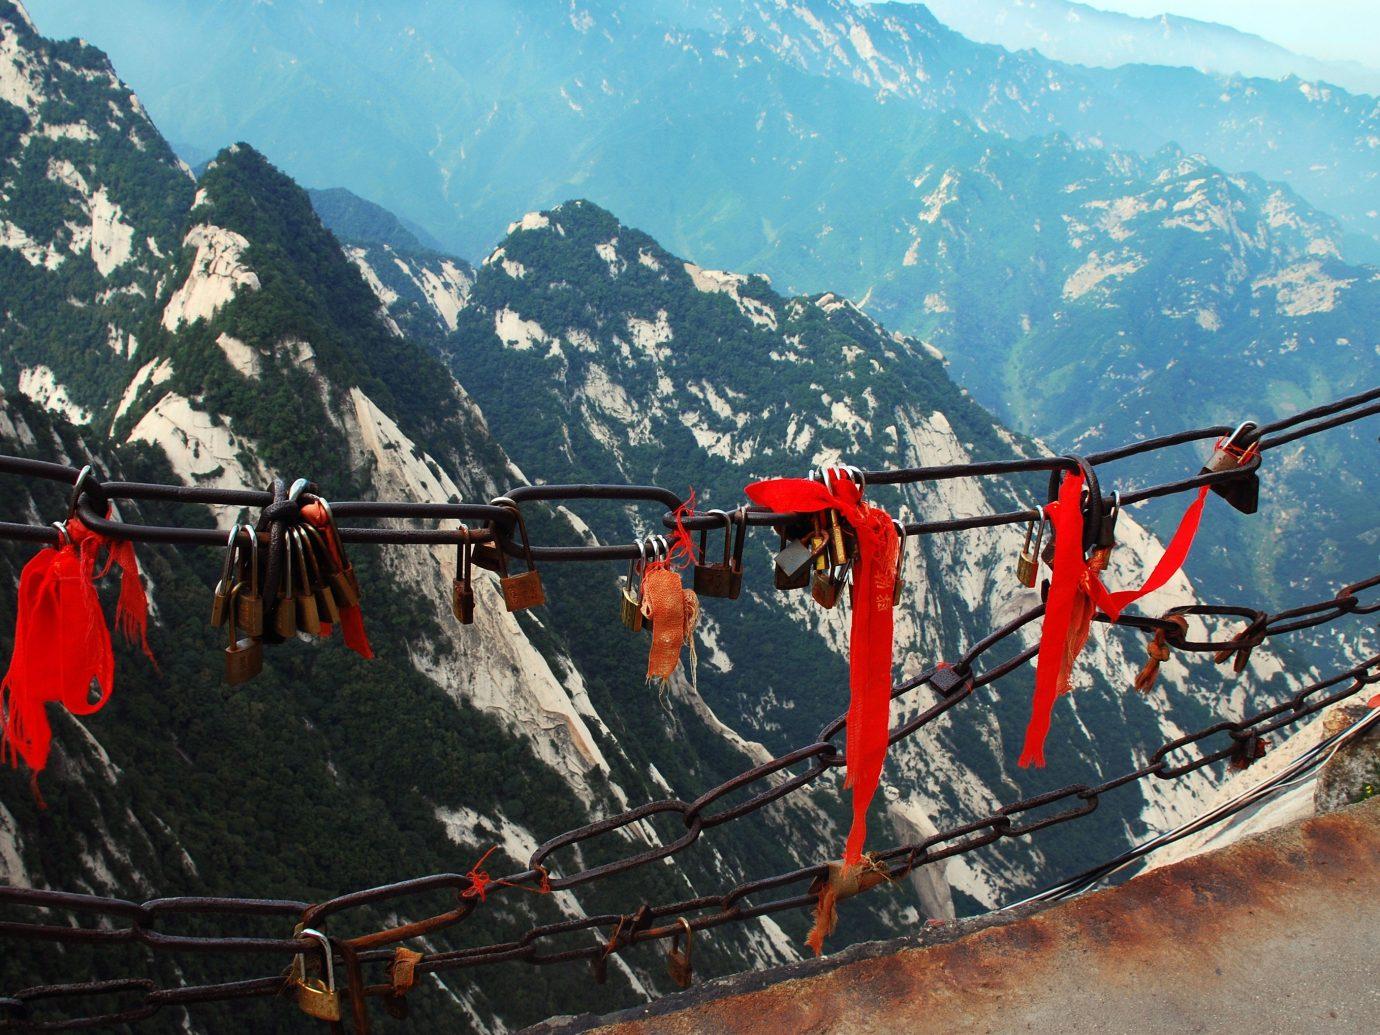 Health + Wellness Outdoors + Adventure mountain outdoor mountain range Nature extreme sport alps snow